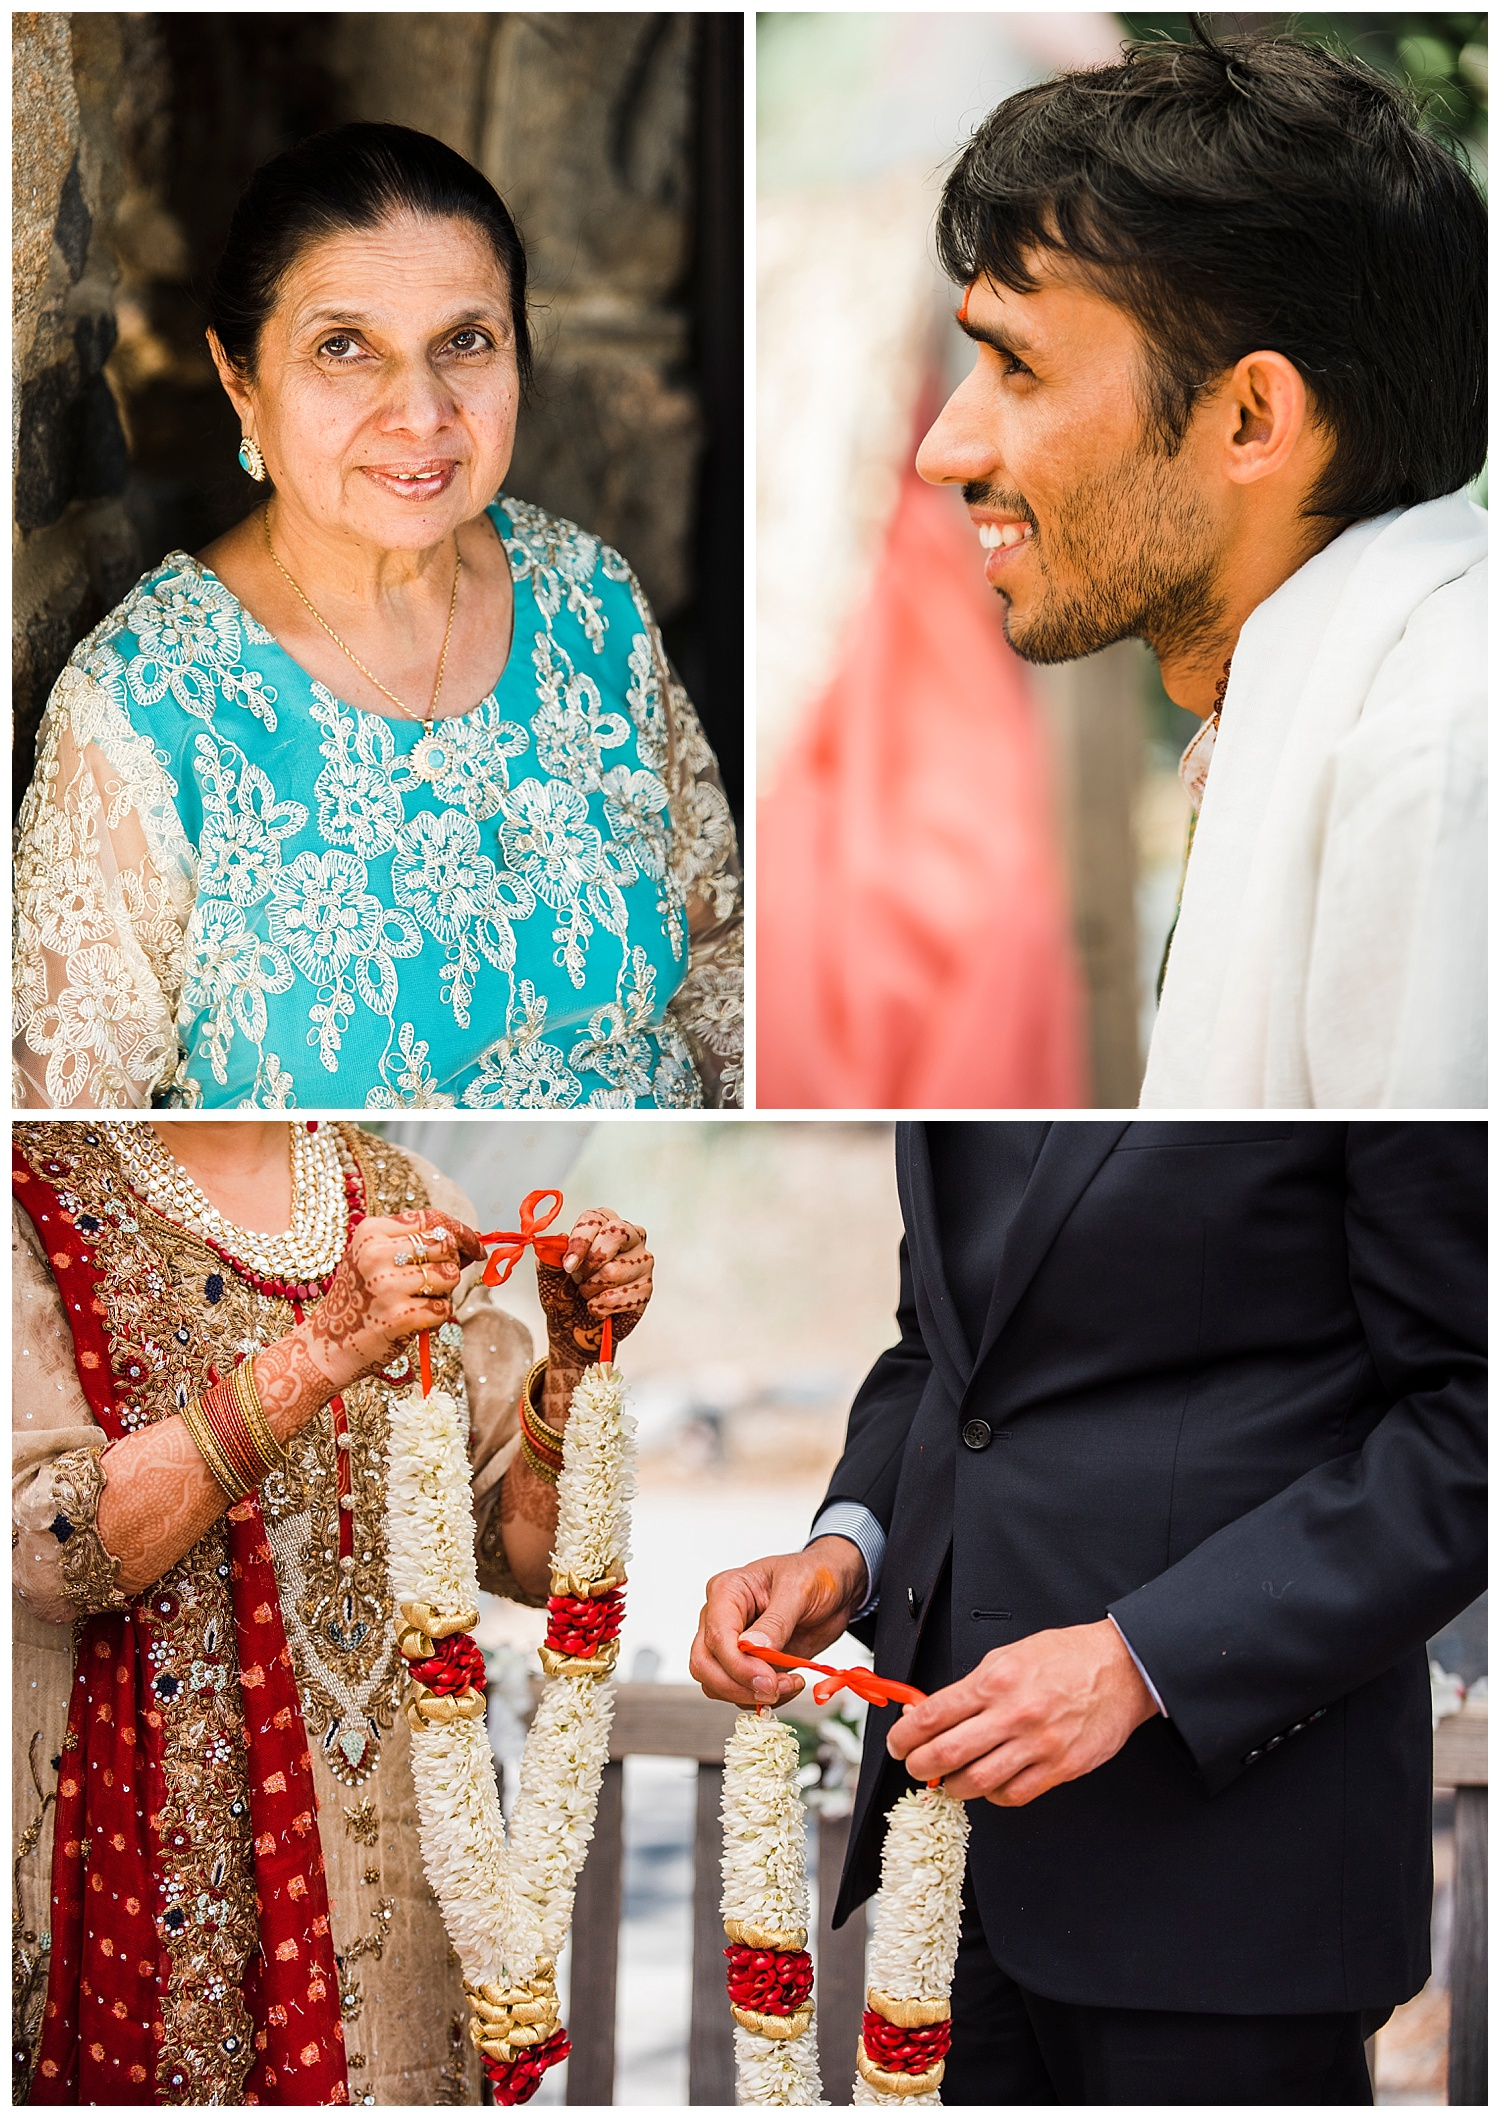 Hindu_Wedding_NYC_Photographer_Apollo_Fields_156.jpg